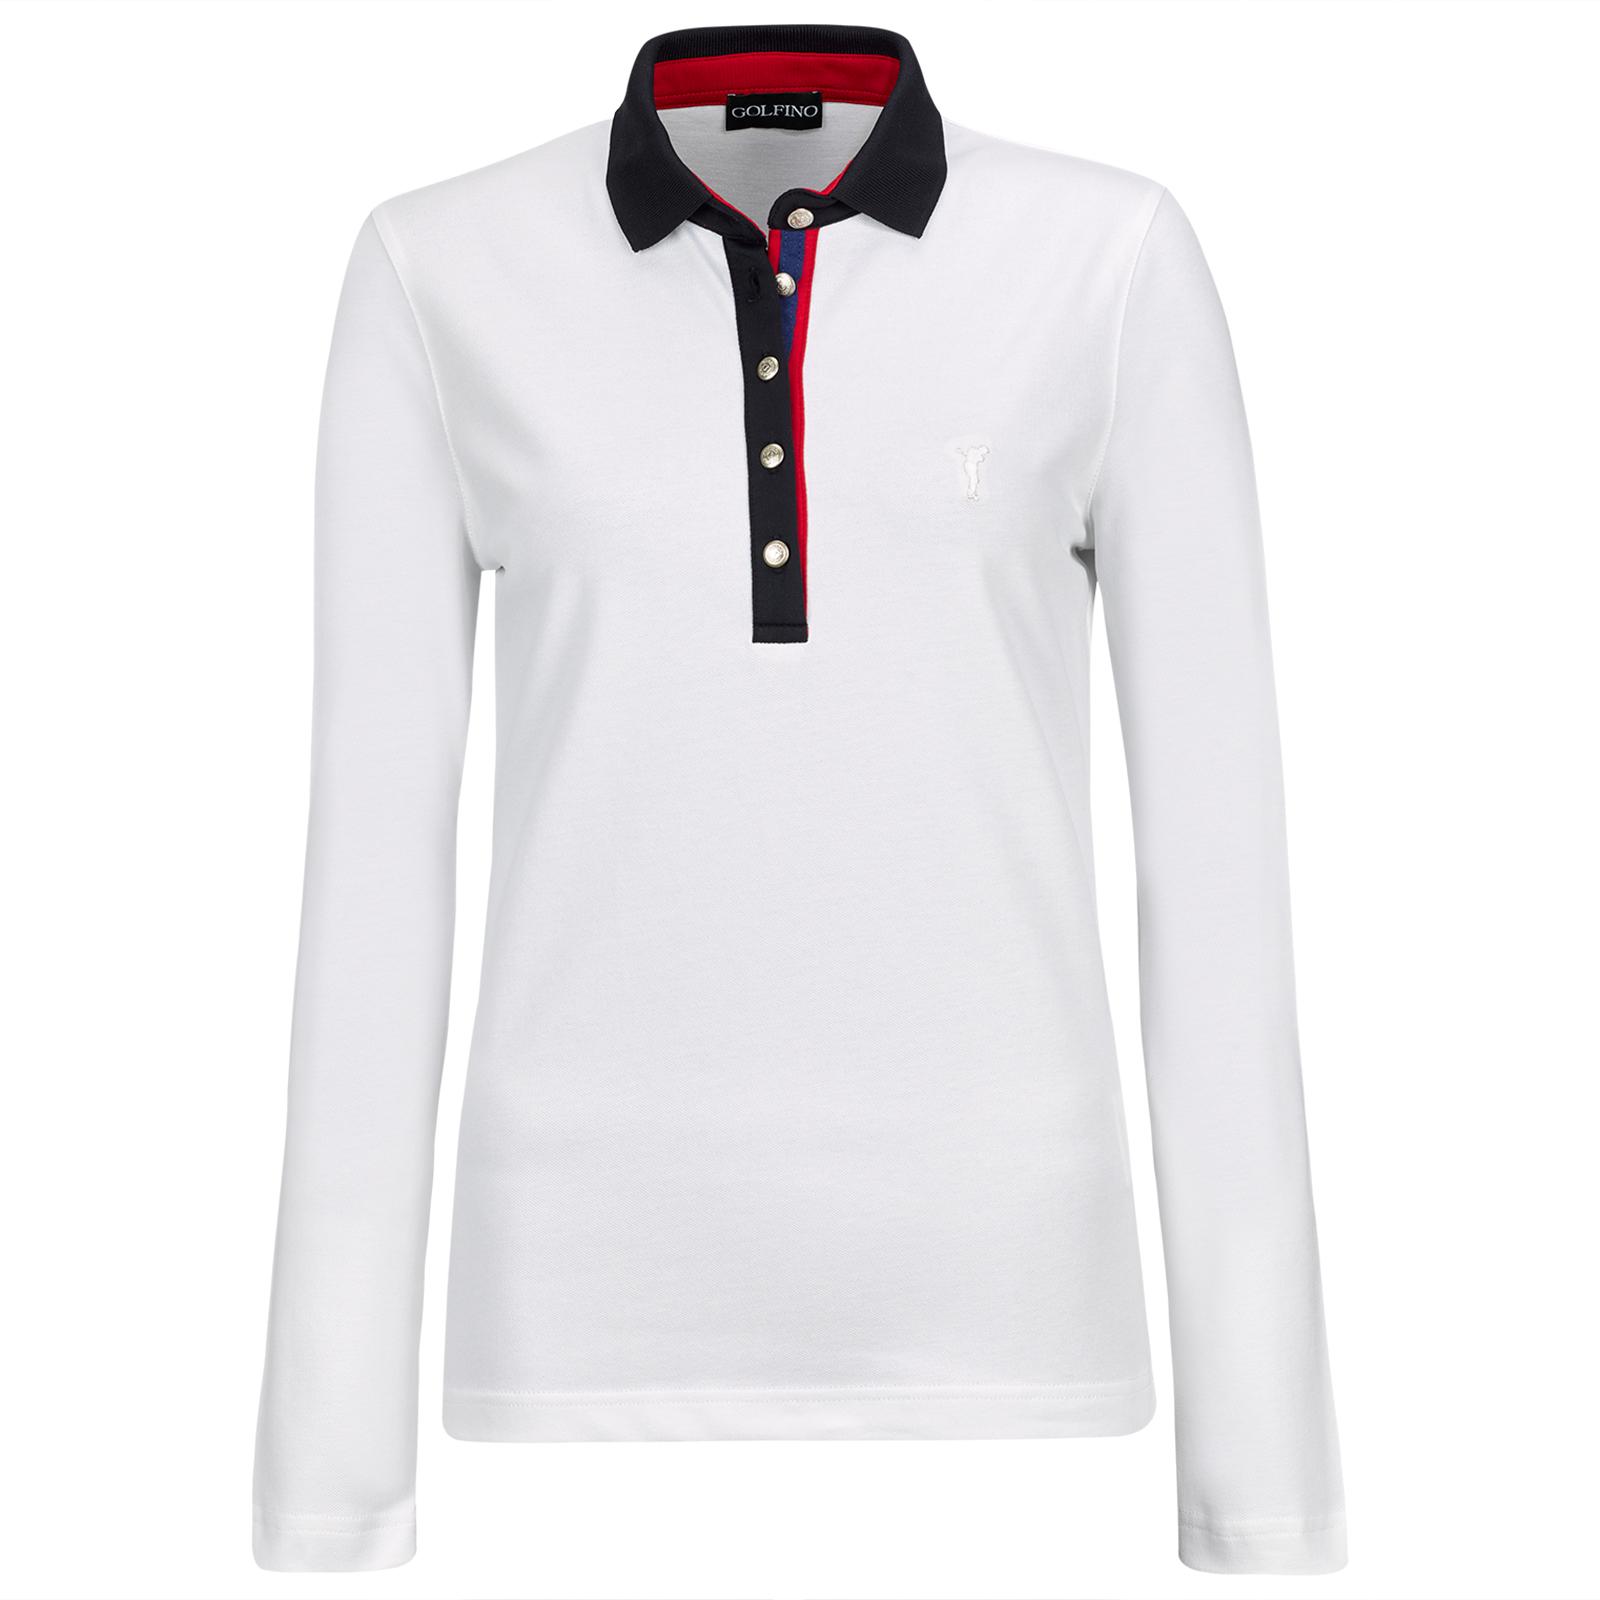 GOLFINO Ladies Tartan Long-Sleeve Polo Shirt | Online Golf